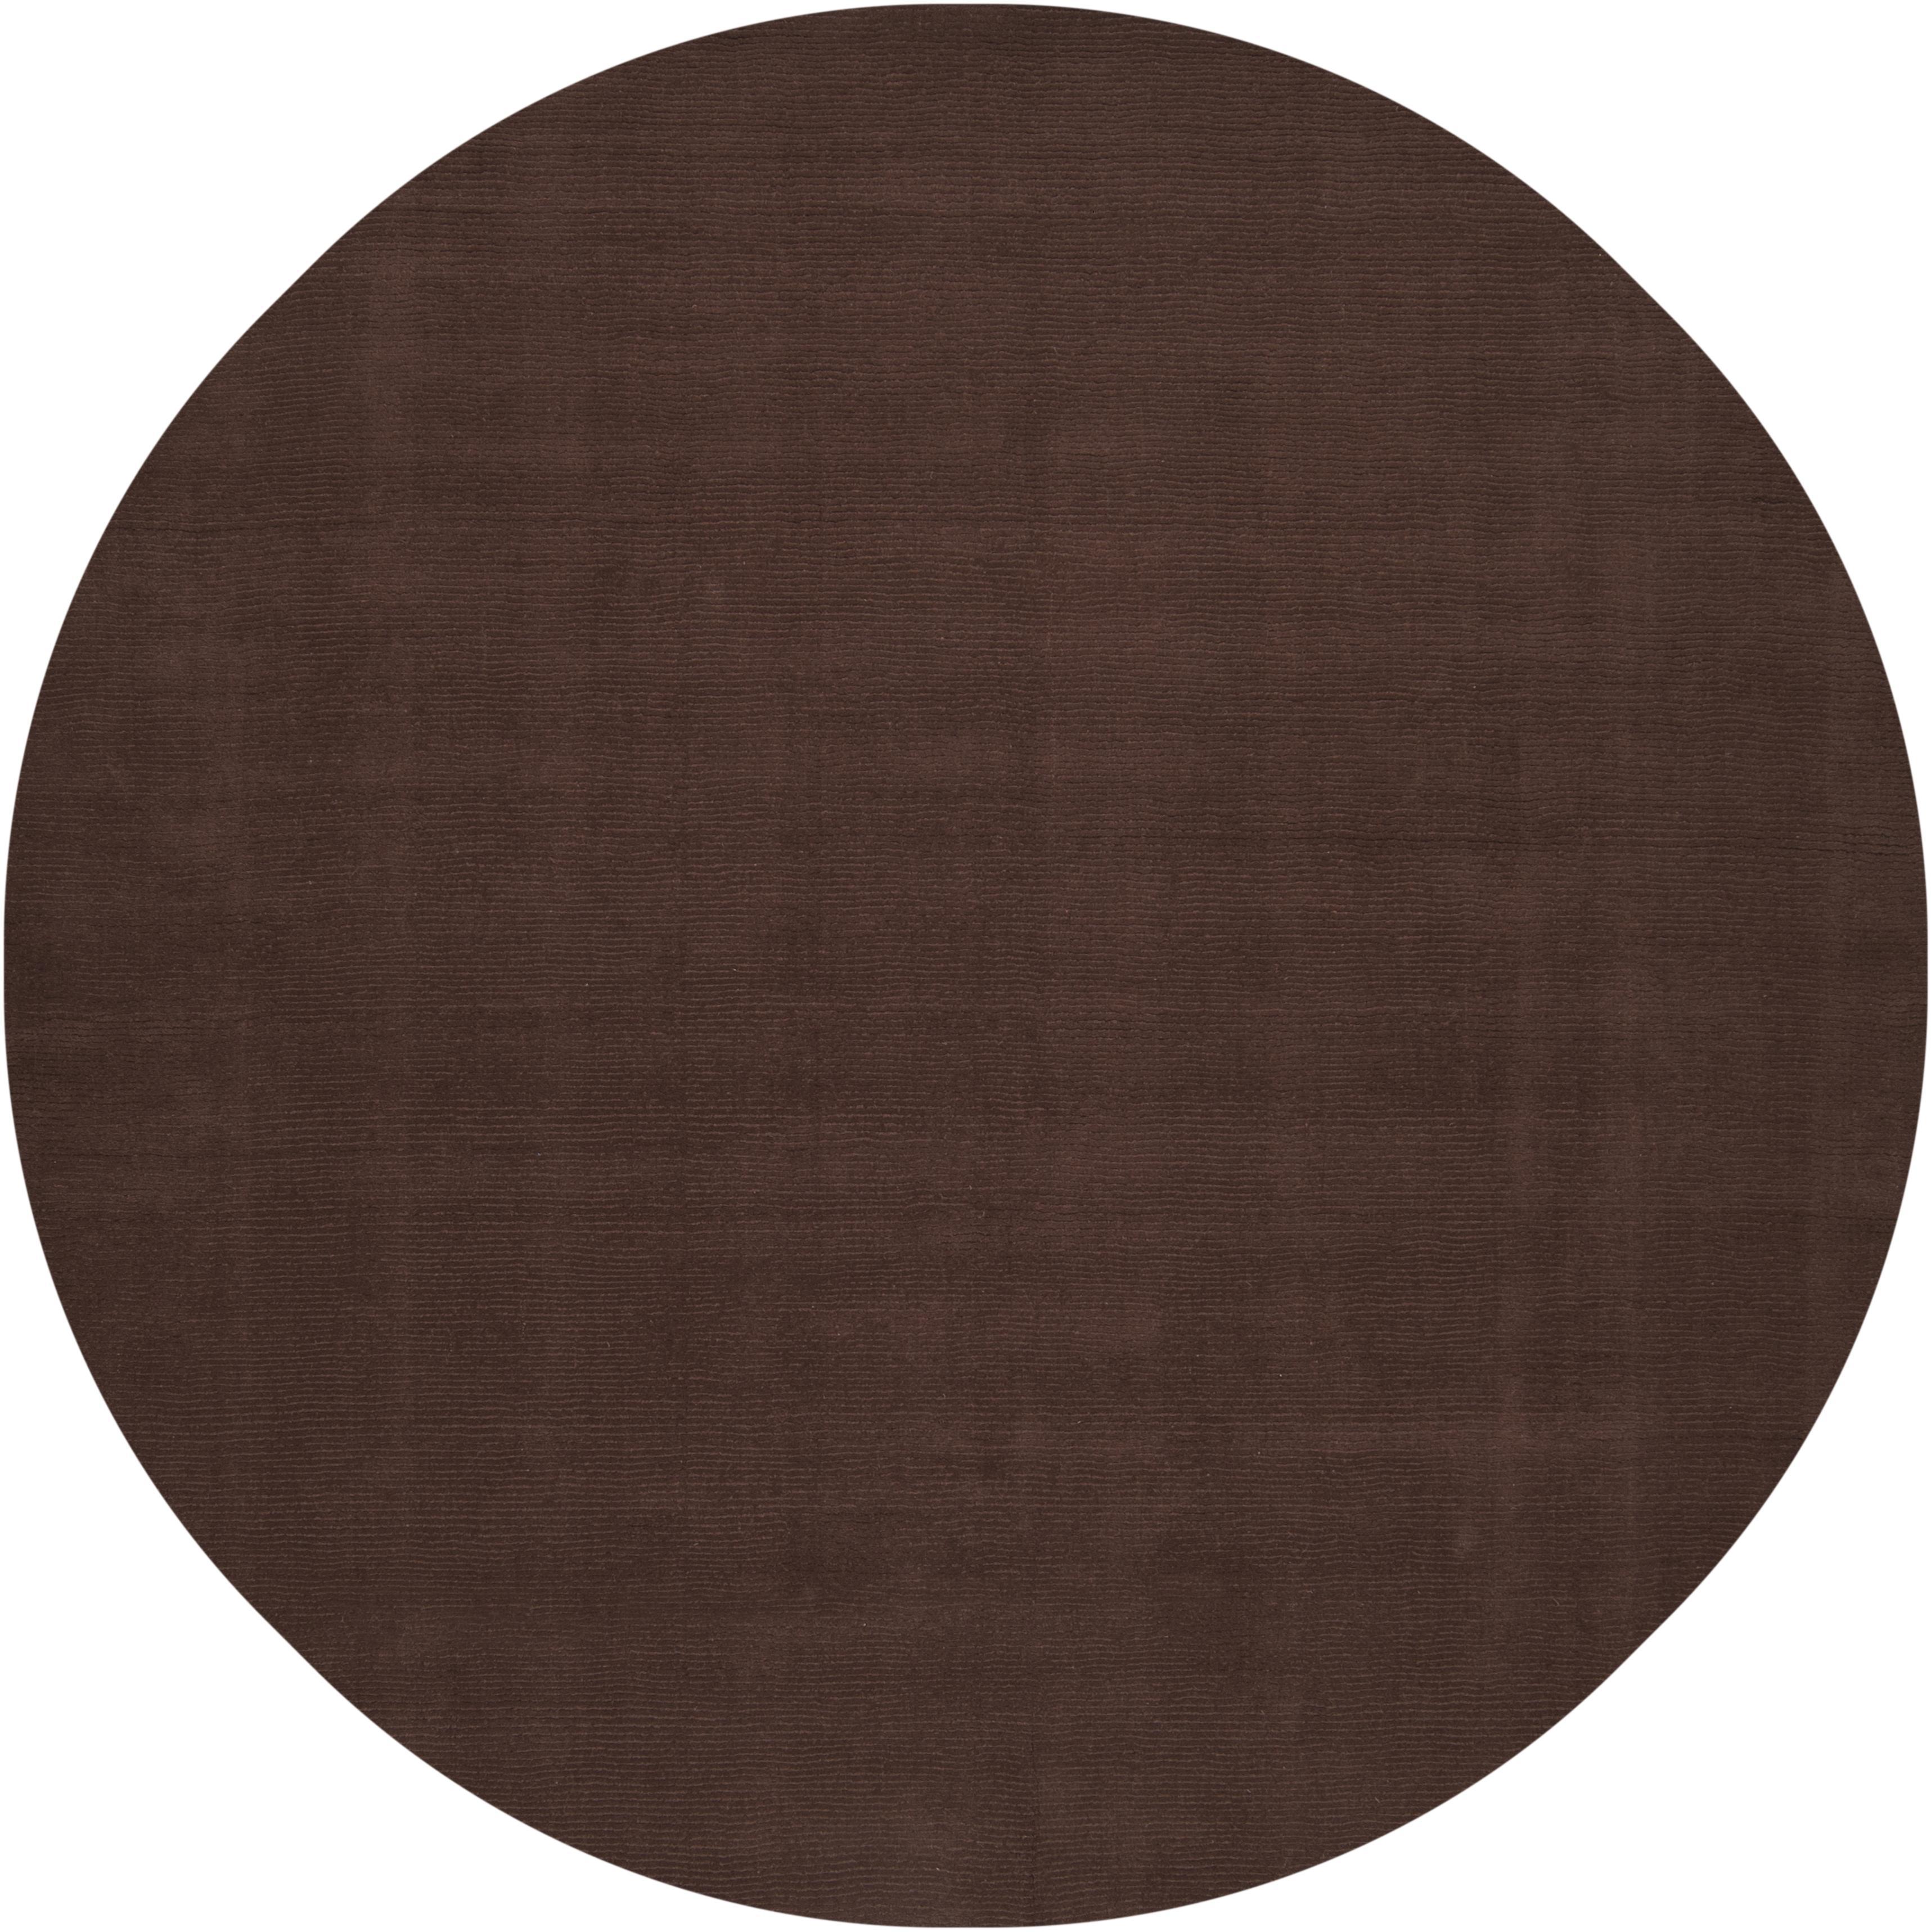 "Surya Rugs Mystique 9'9"" Round - Item Number: M334-99RD"